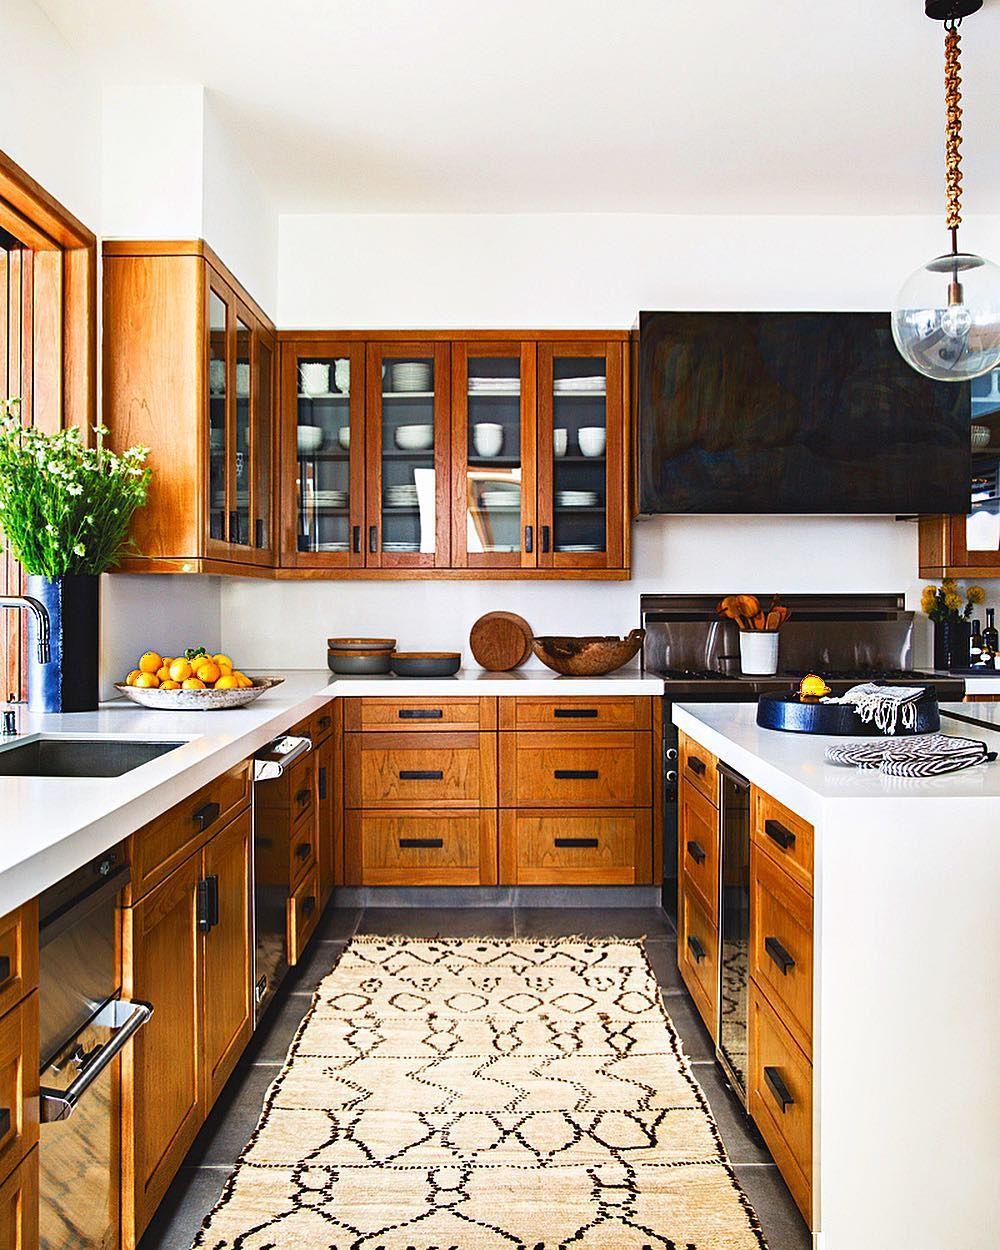 Driftwood Vibes Luxeathome Sandow Phot Kitchen Inspiration Design Tuscan Kitchen Kitchen Inspirations